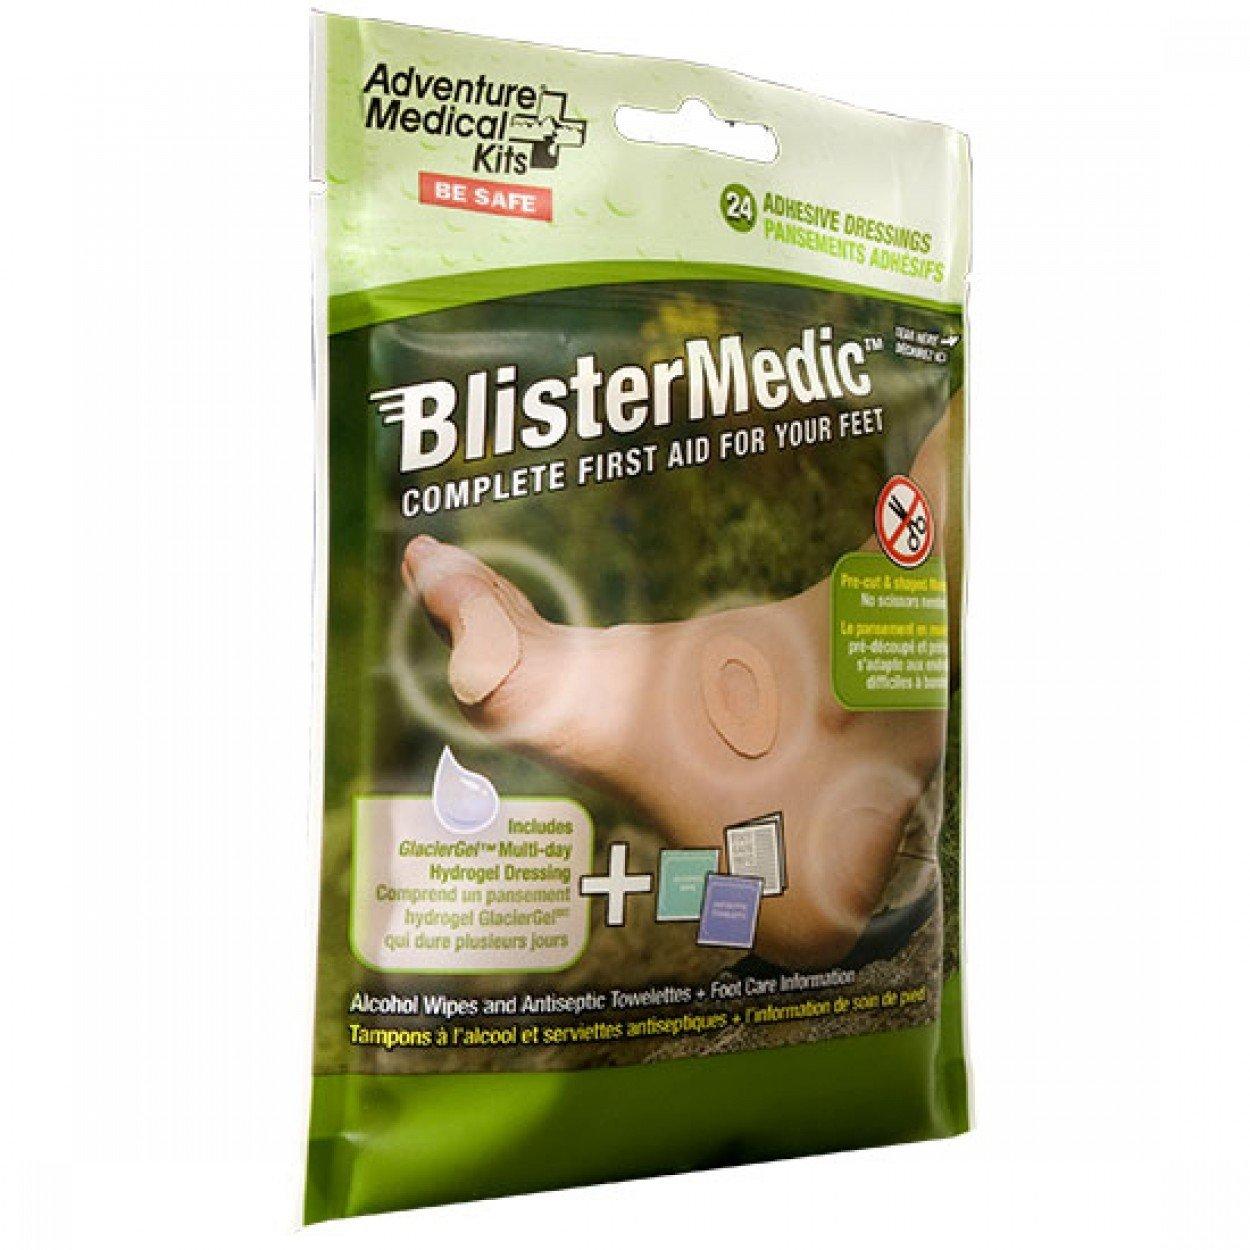 Adventure Medical Kits Blister Medic